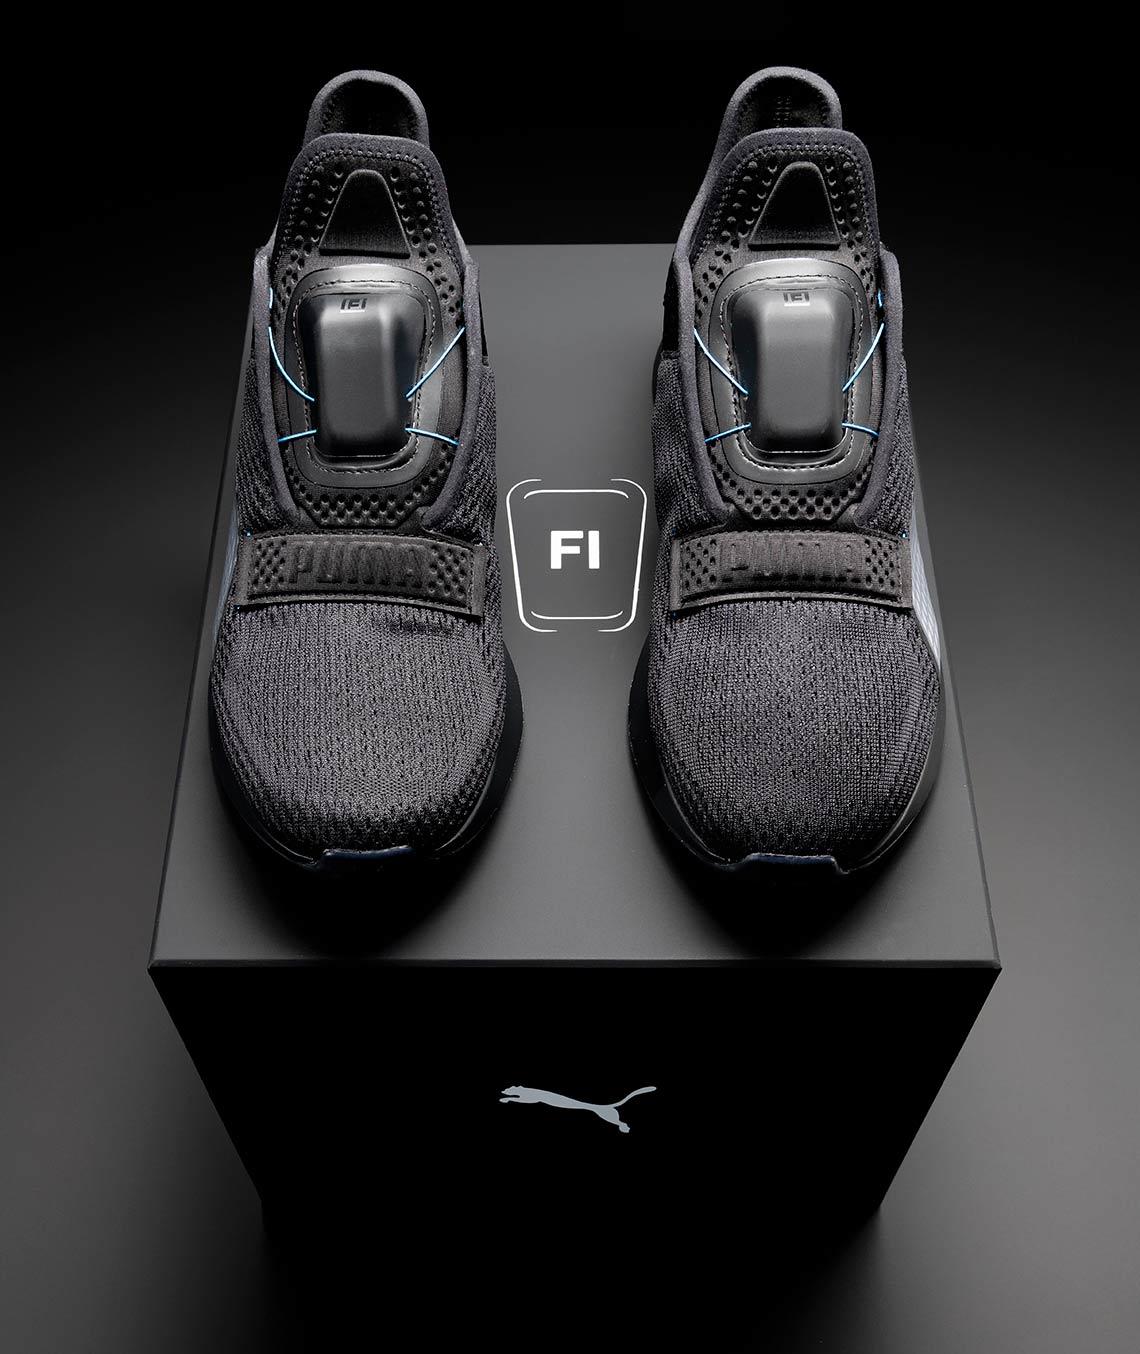 puma new shoes launch